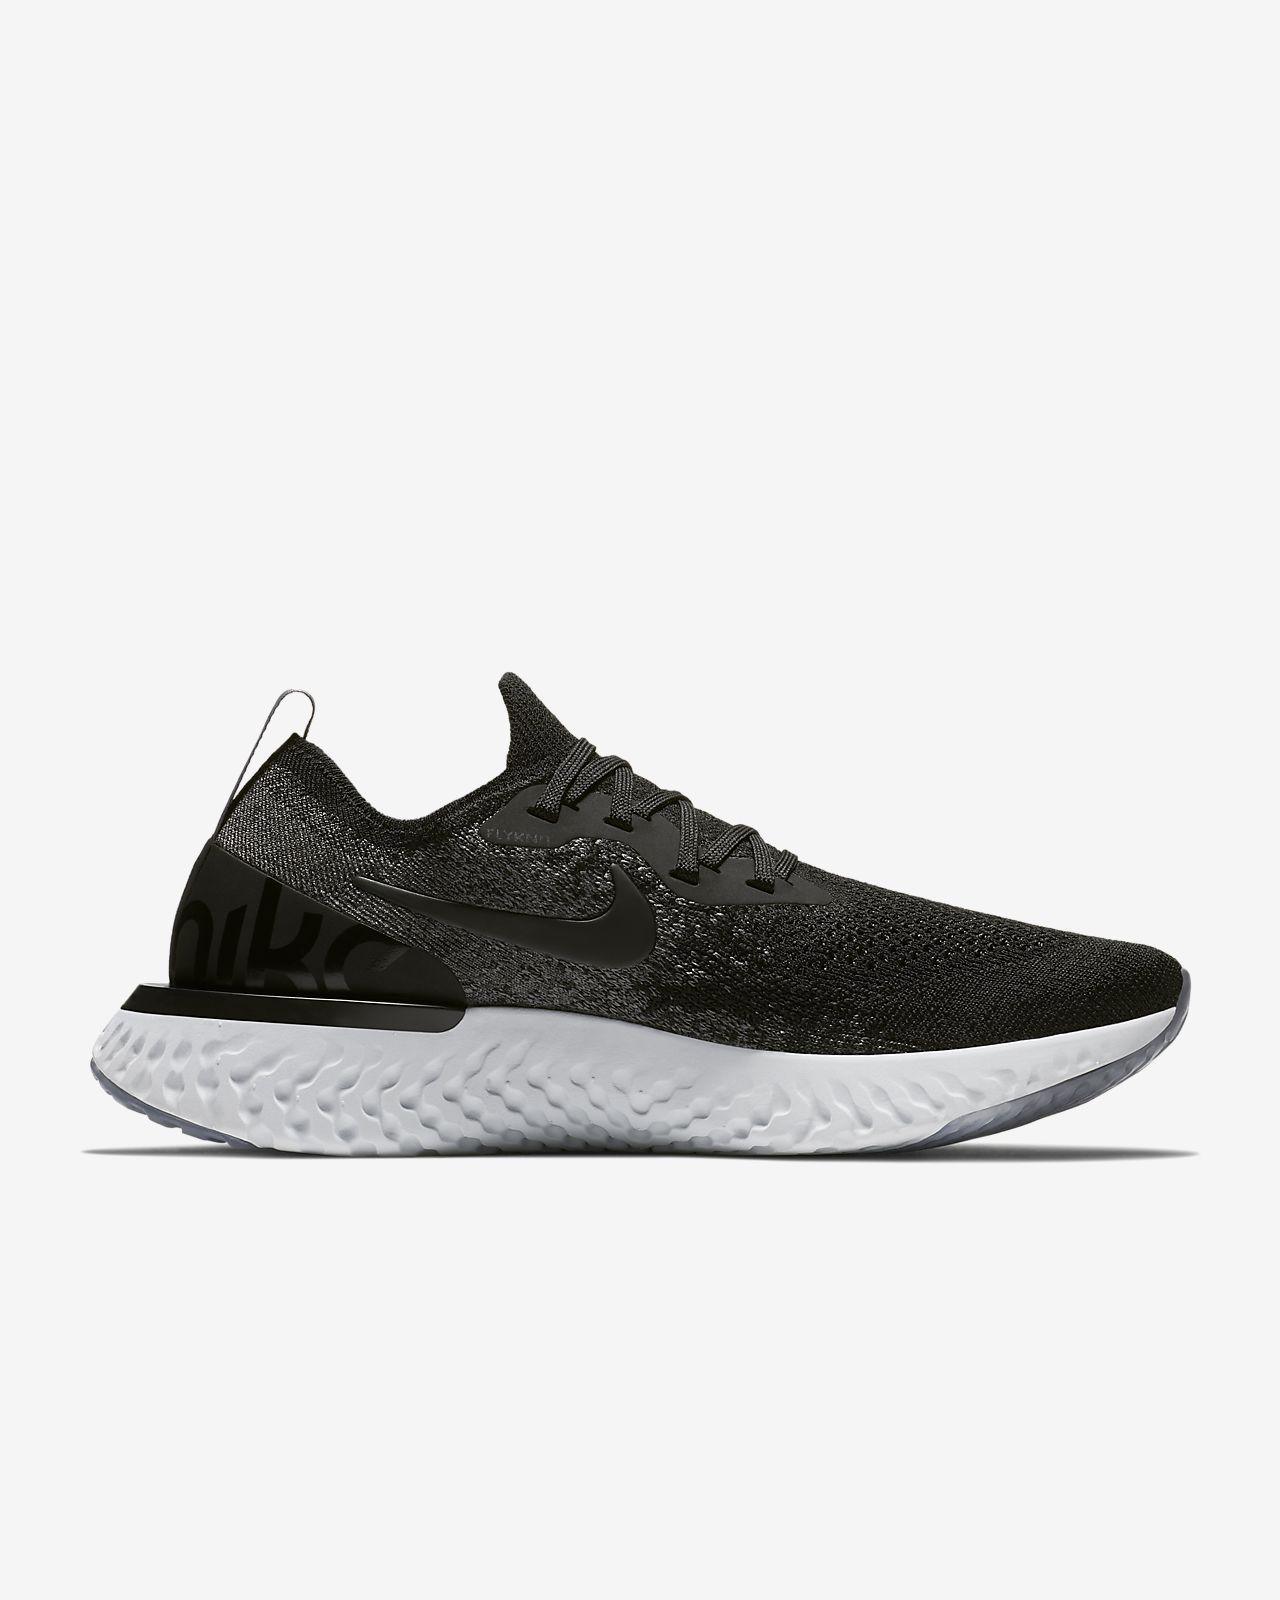 Double Ton Chaussures Coureur Gris Nike 7dGcYS